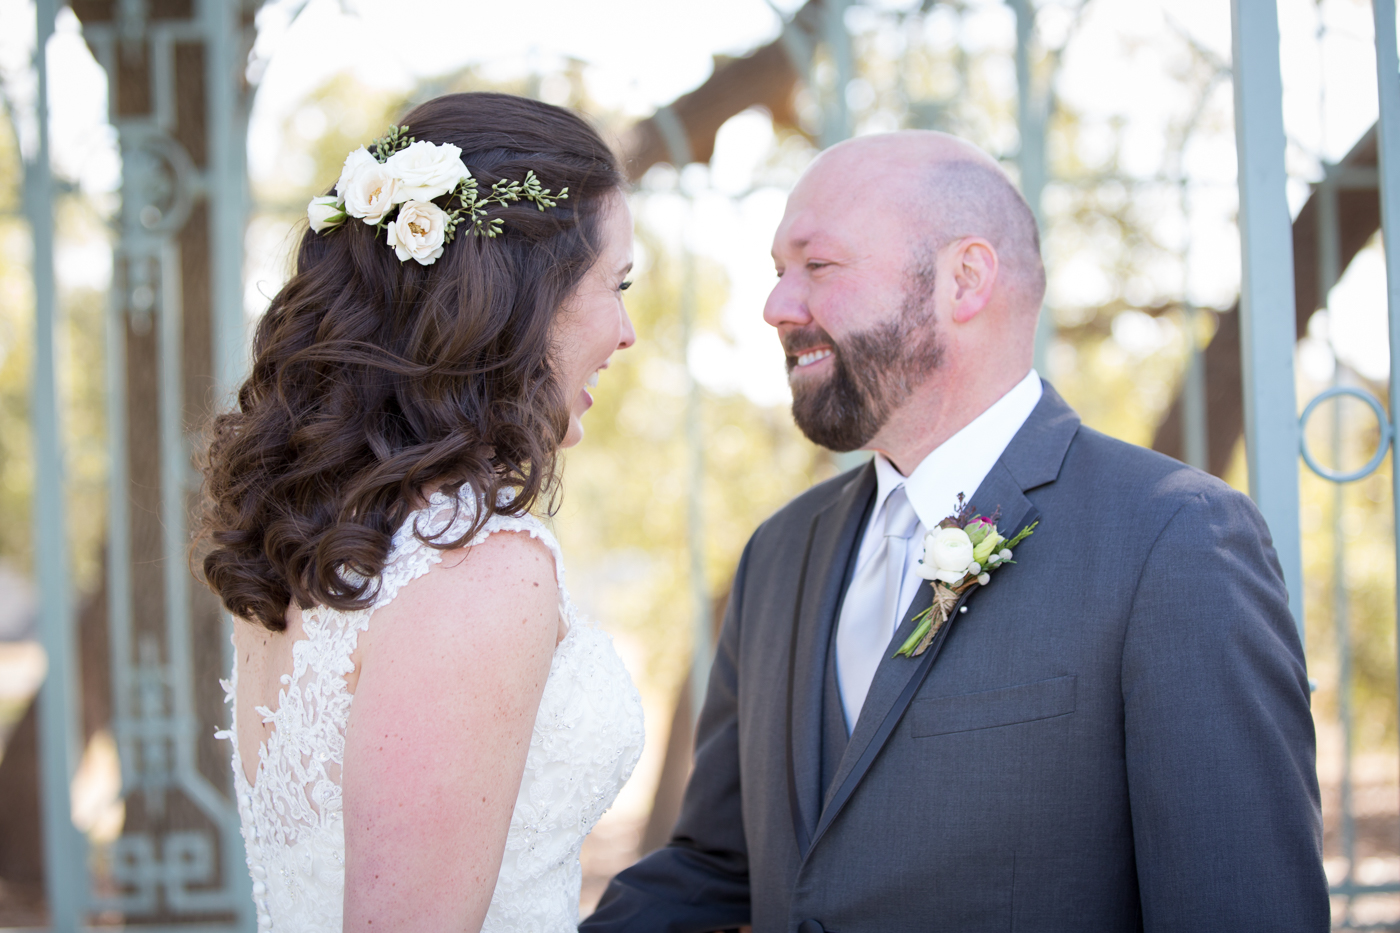 Austin-wedding-photo-and-video-010.jpg